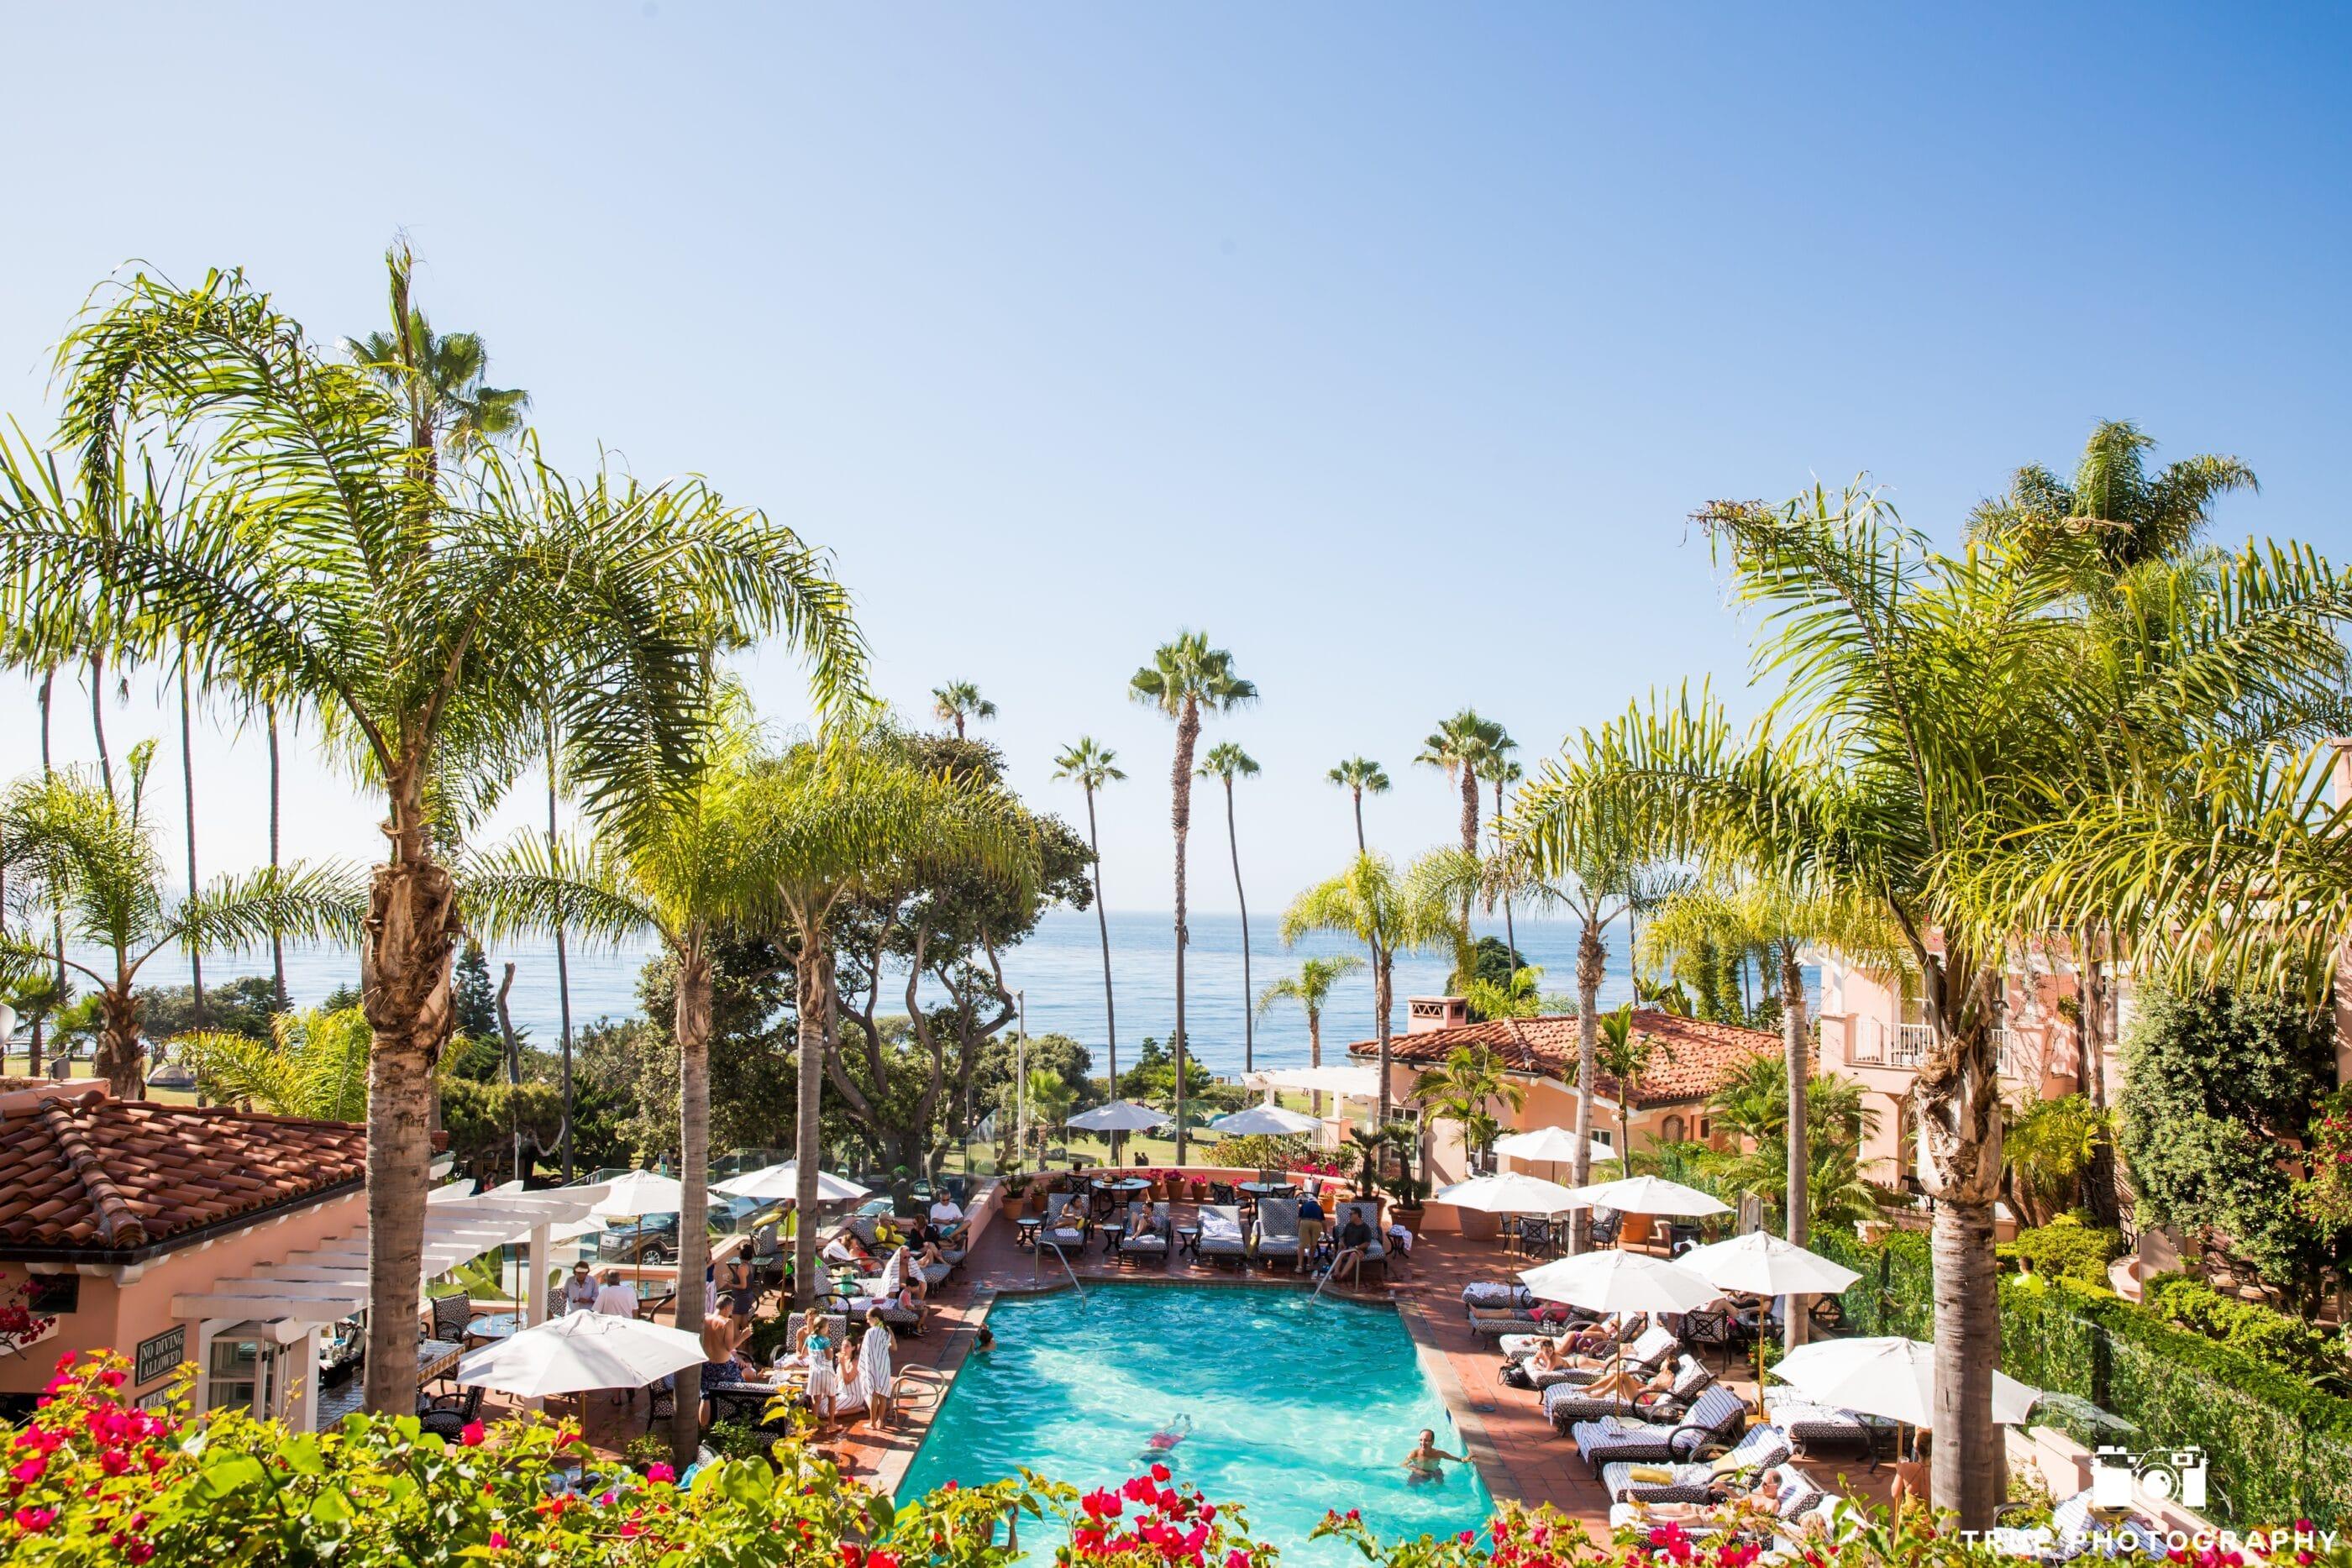 View over the outdoor pool to La Jolla Cove from La Valencia Hotel